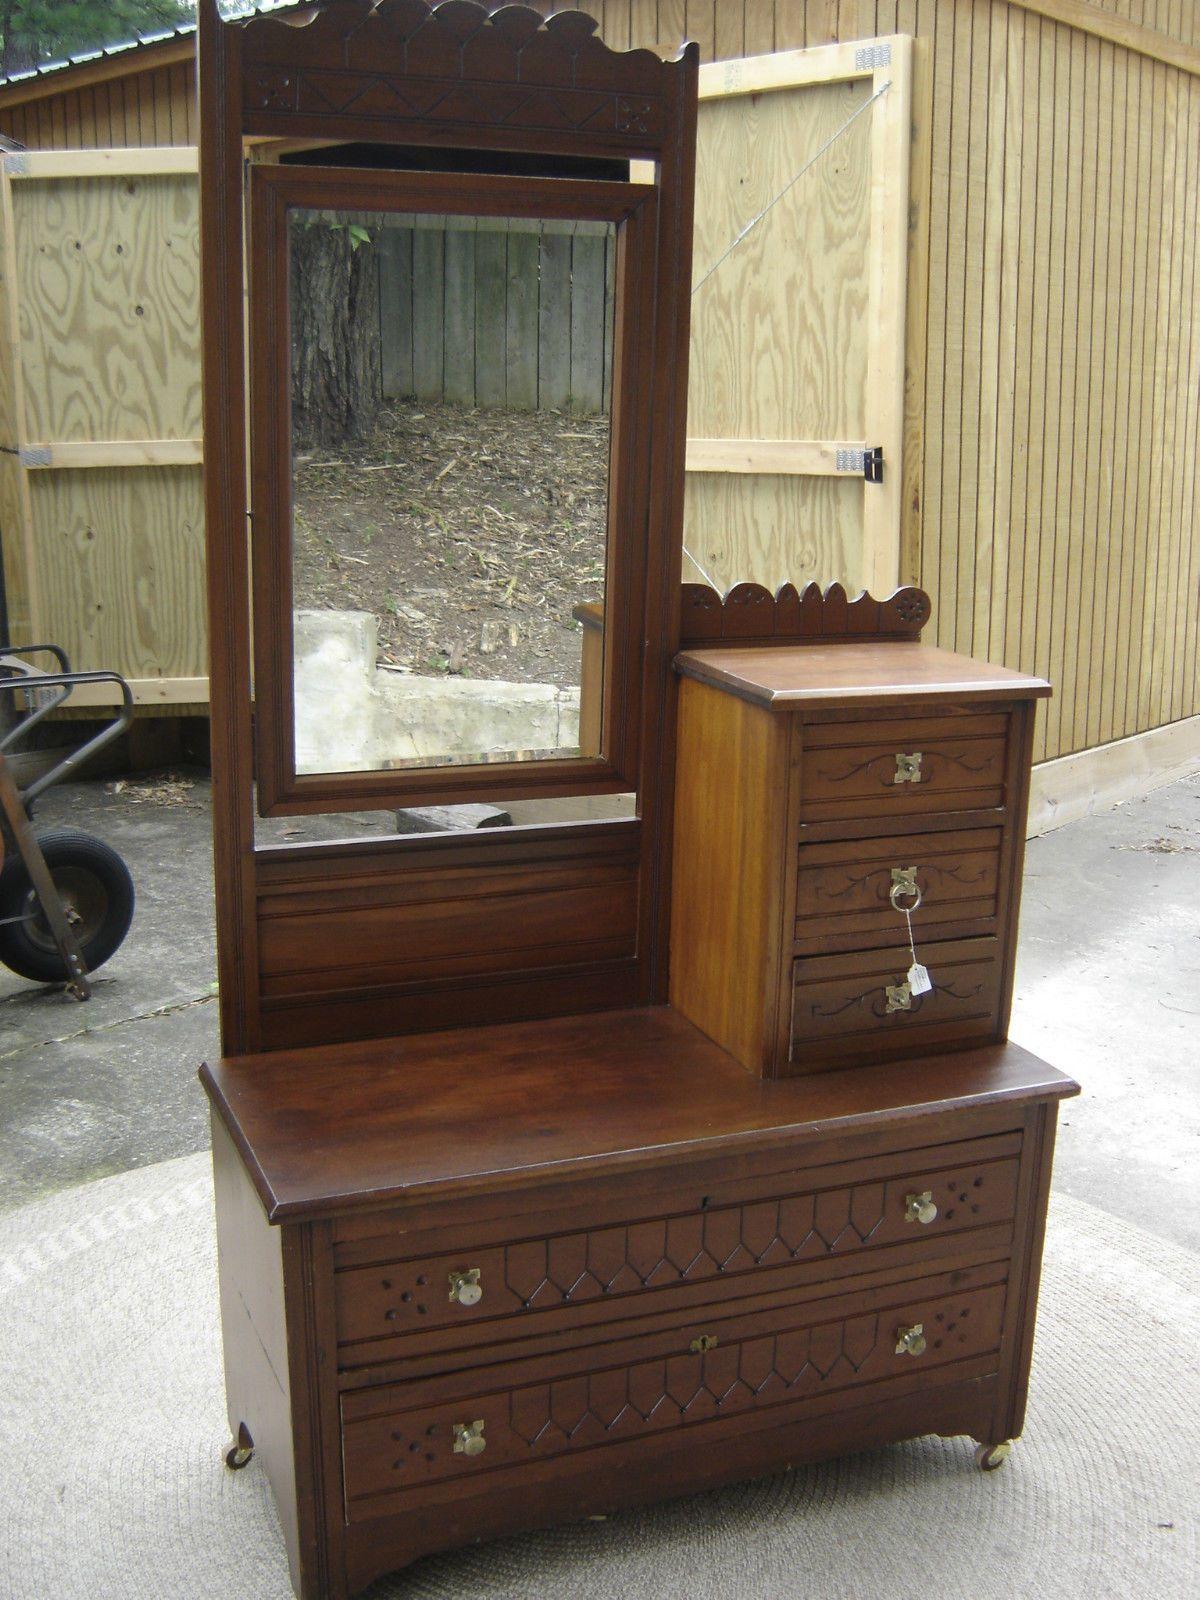 Cherry Eastlake Gentleman s Dresser with Hat Box 6710   eBay. Cherry Eastlake Gentleman s Dresser with Hat Box  6710   Hat boxes